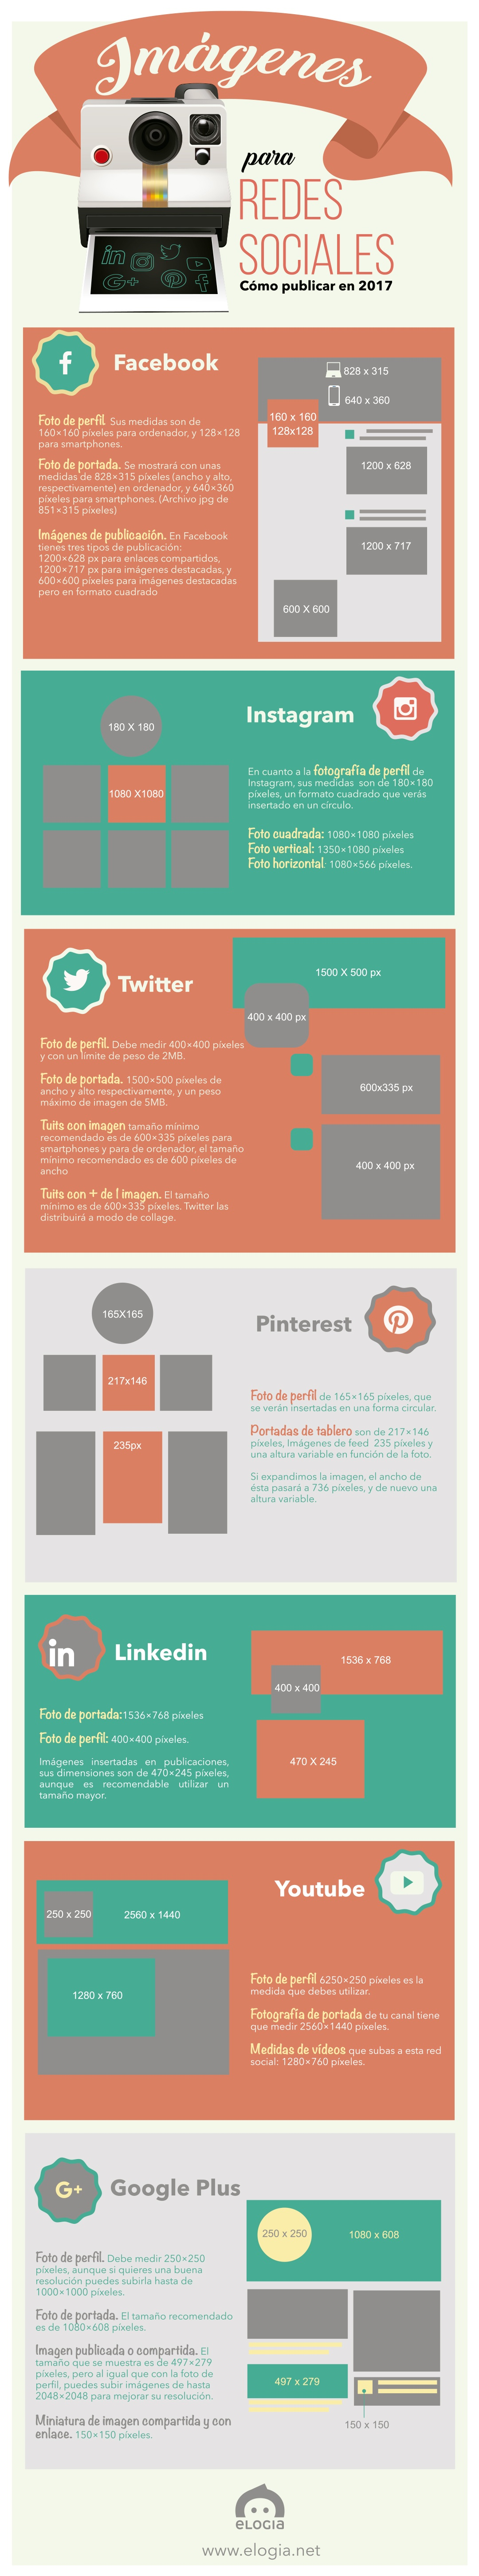 infografia-imagenes-rrss.jpg